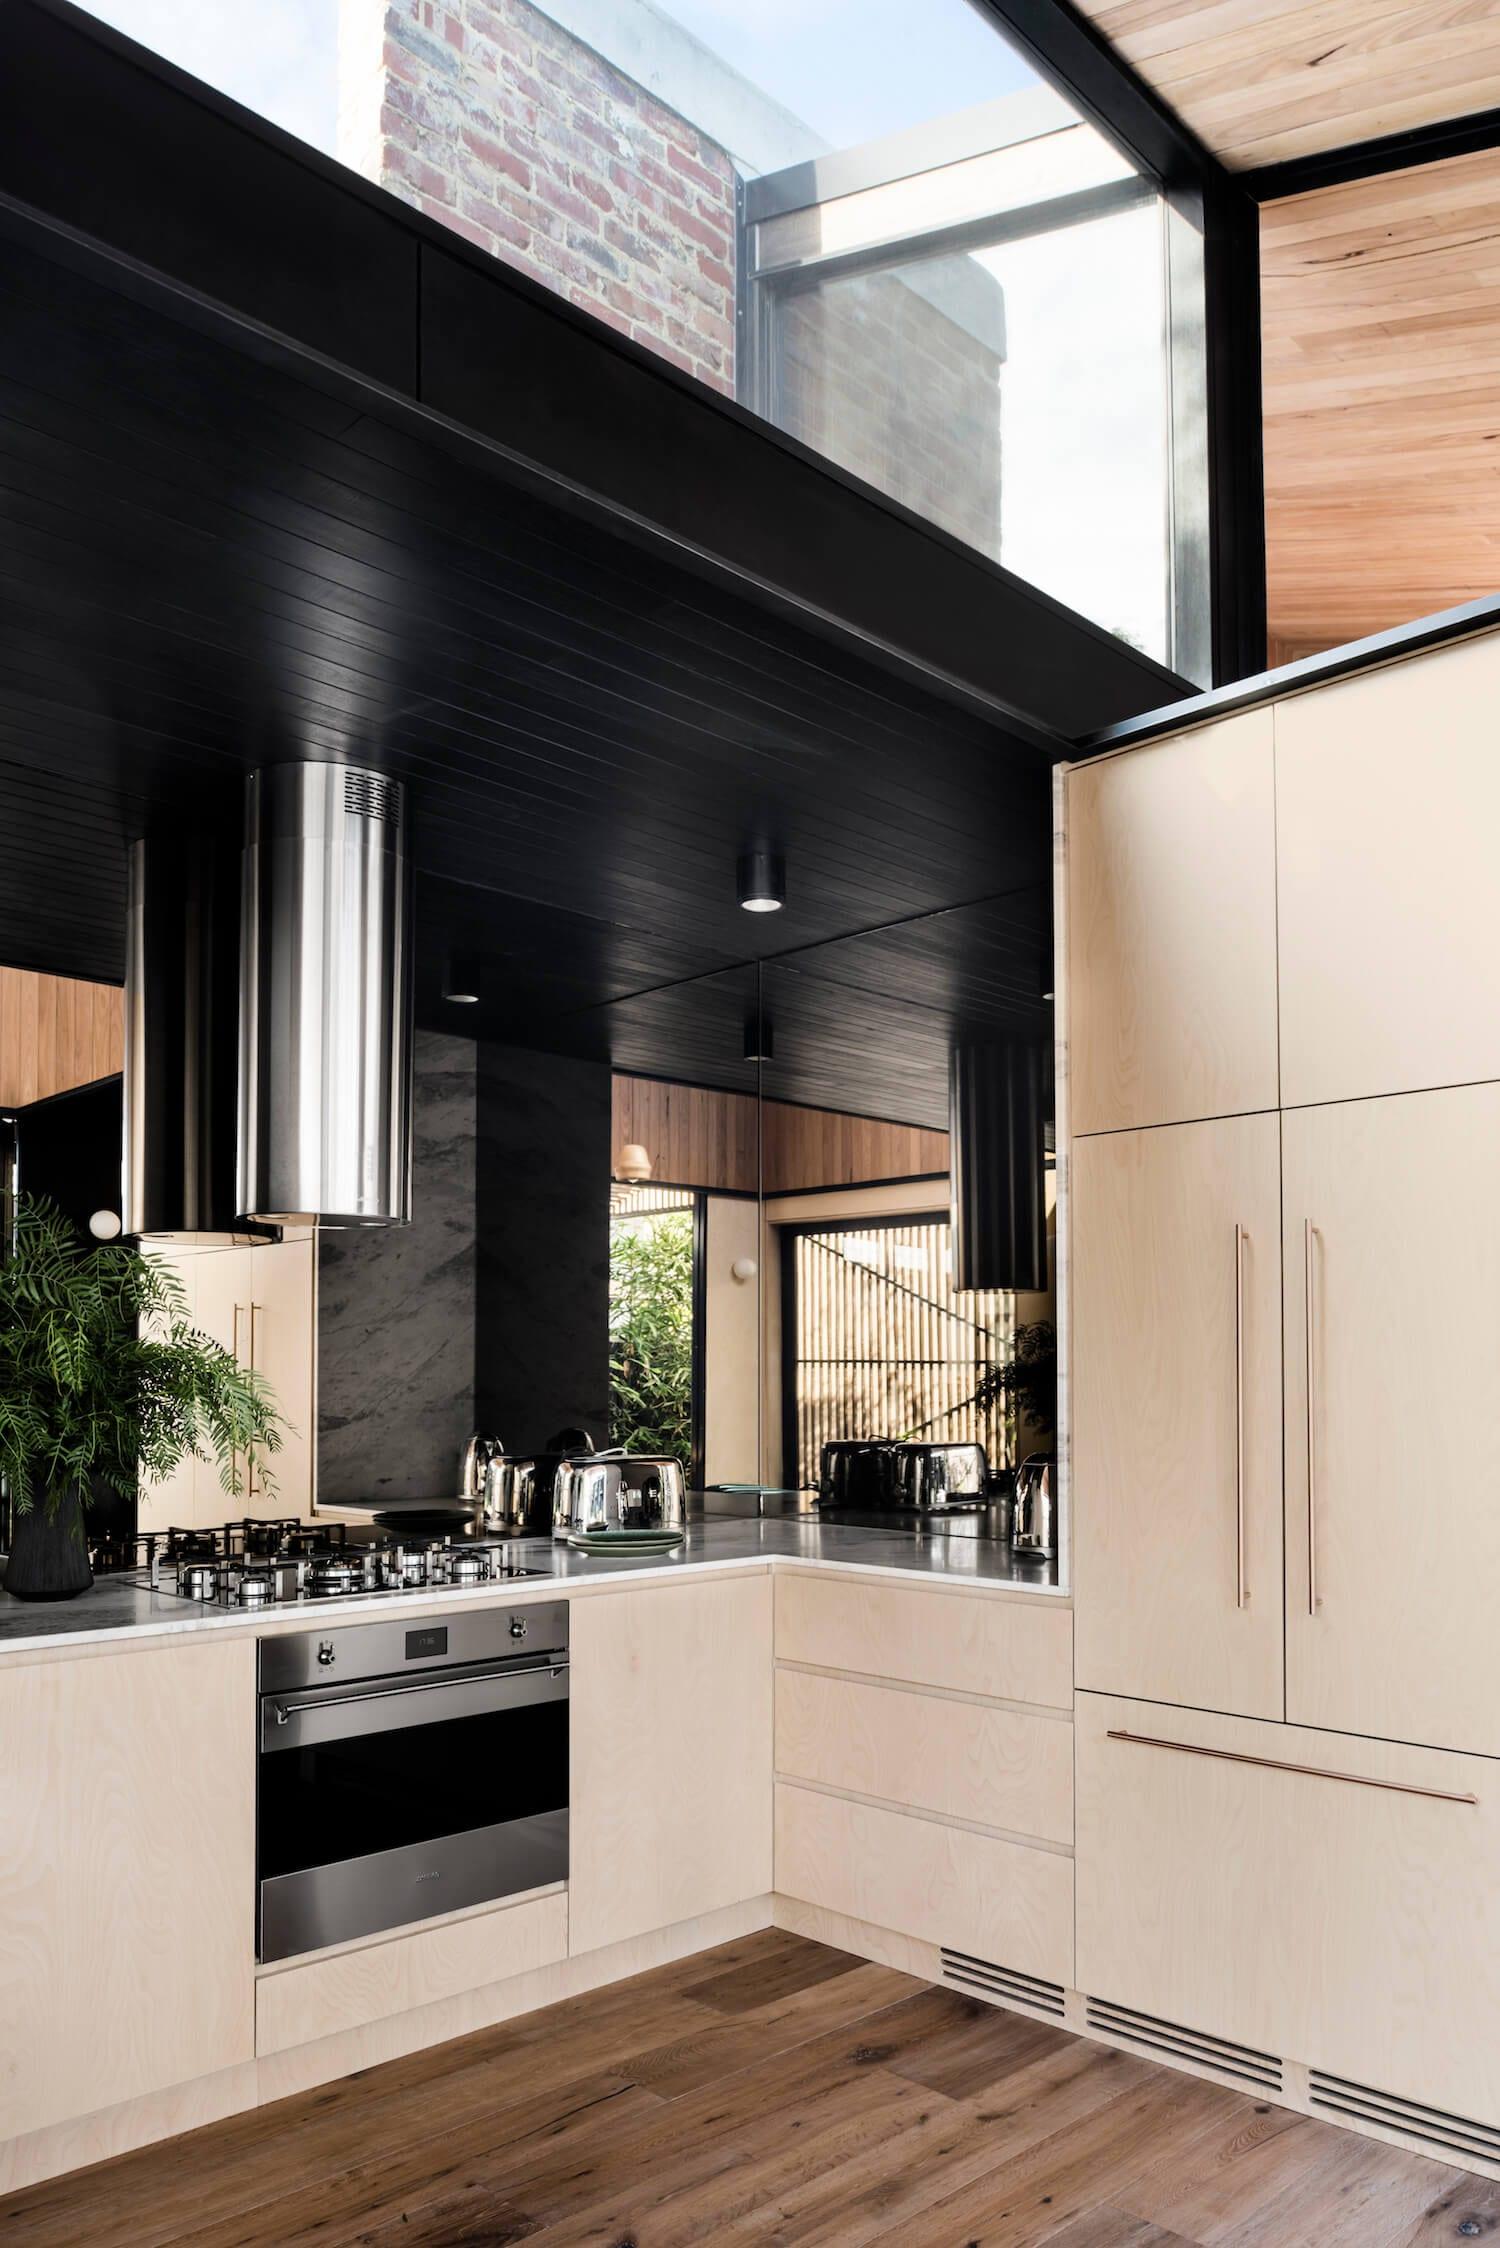 Smeg Classic in Light Corridor House by FIGR Architecture & Designm | Yellowtrace